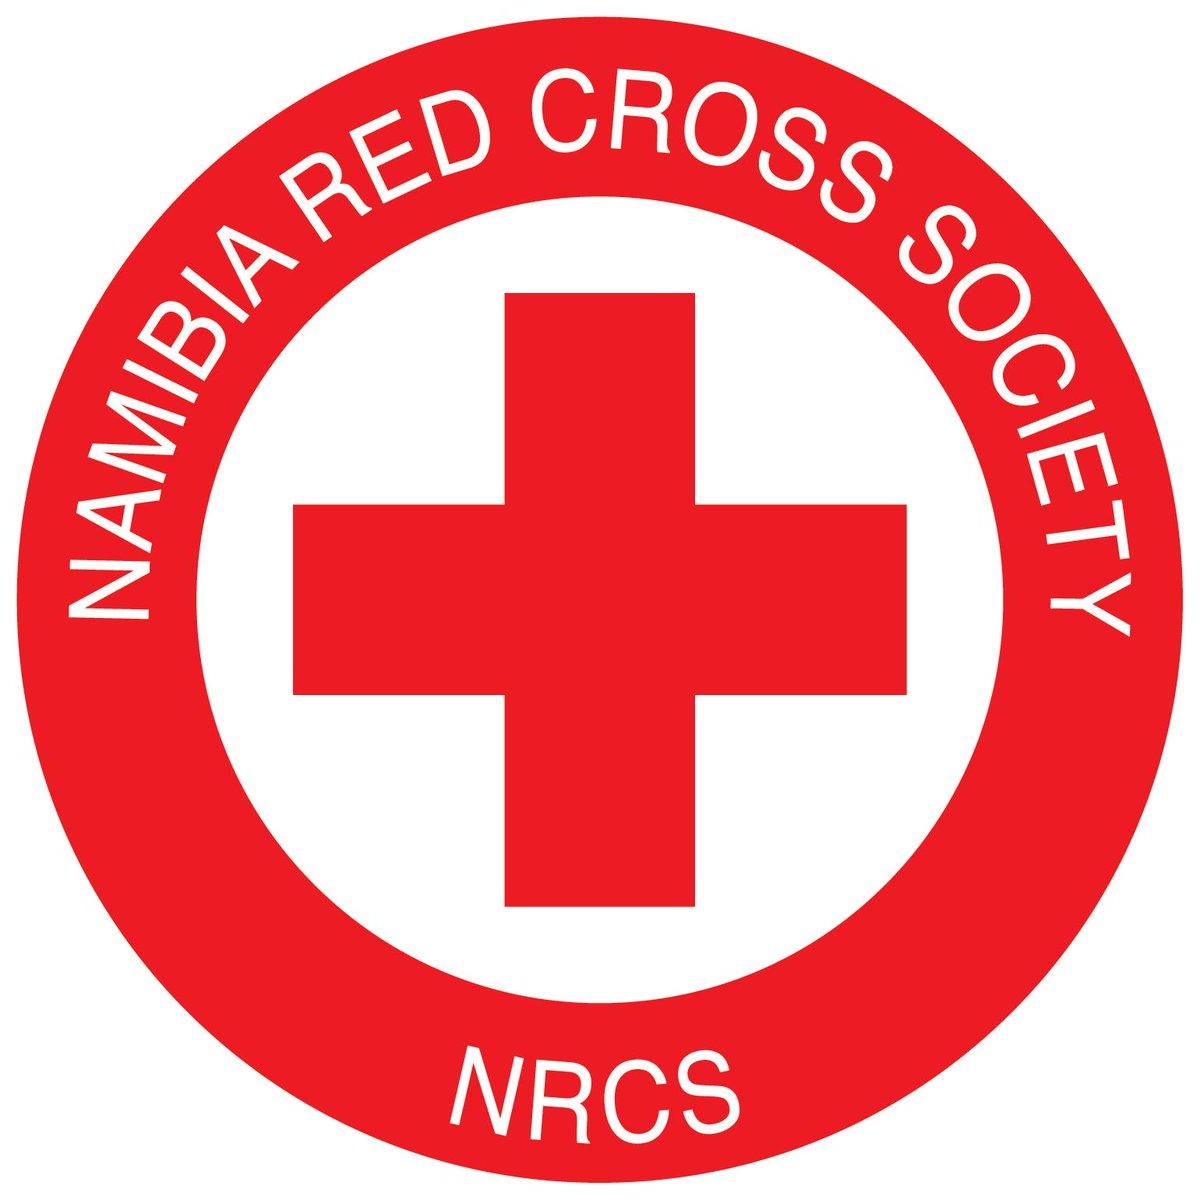 Namibia Red Cross (@NamibiaRedCross) | Twitter